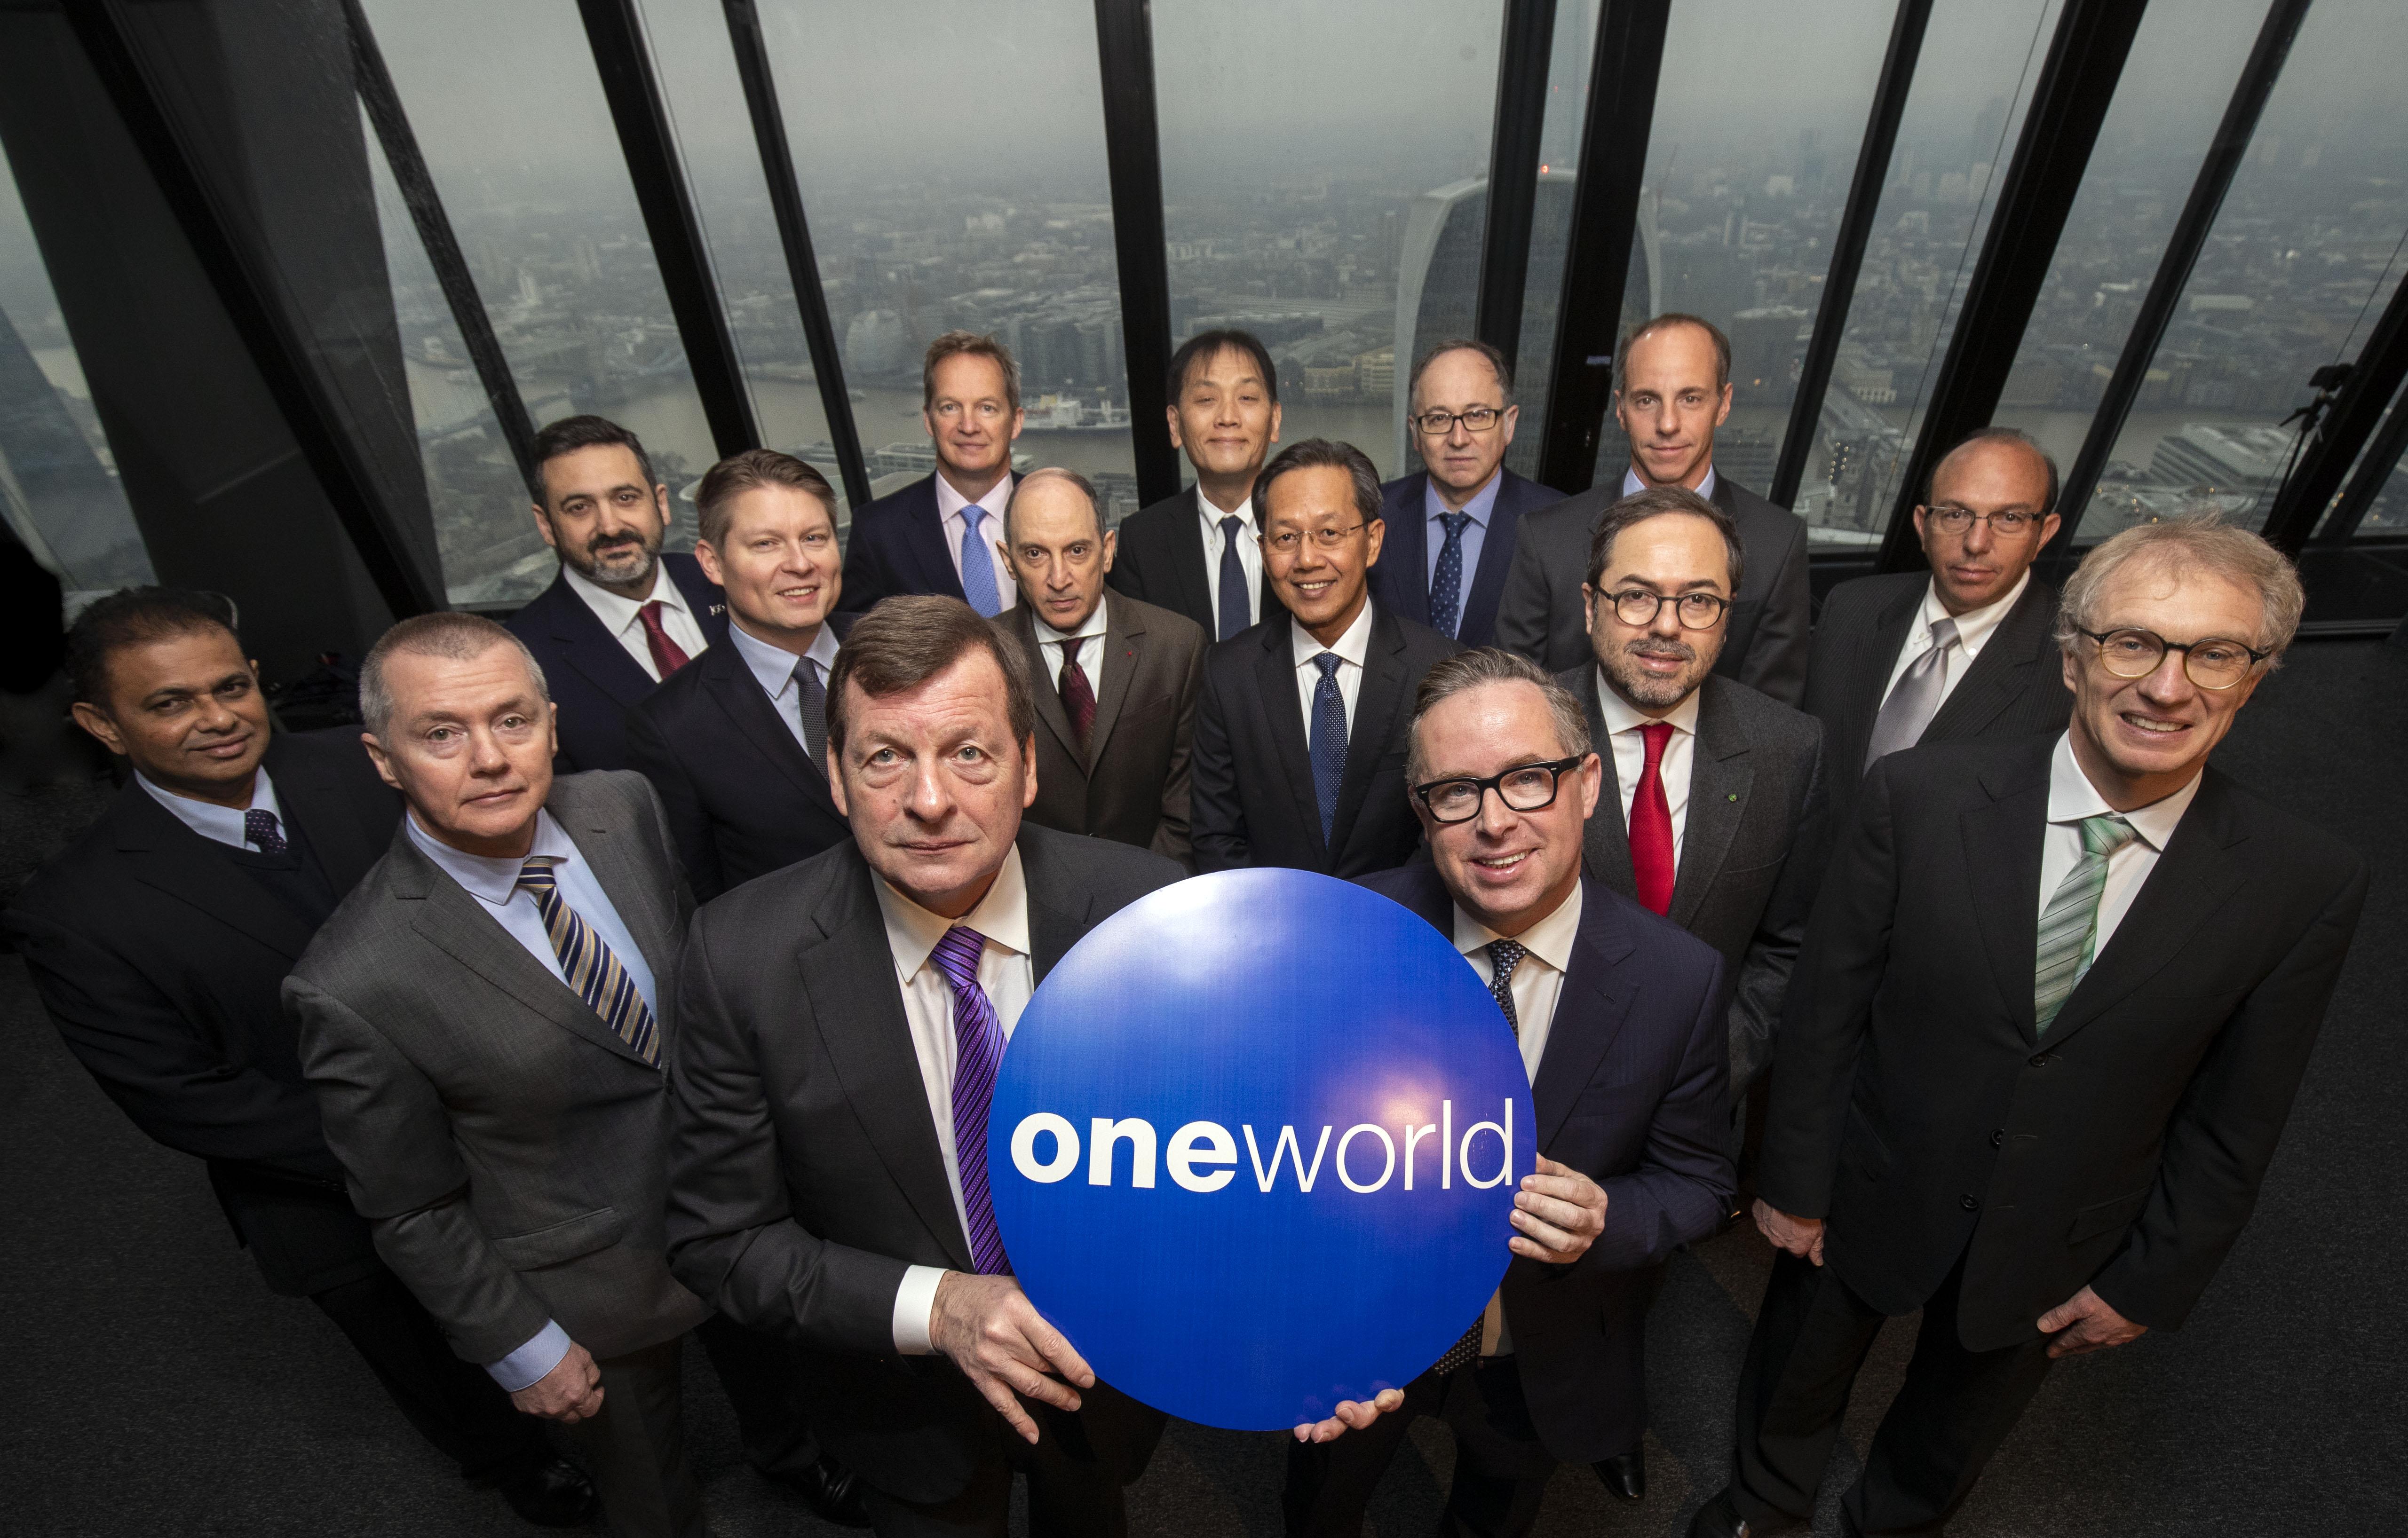 oneworld-20-years-Press-event-1FEB19-03